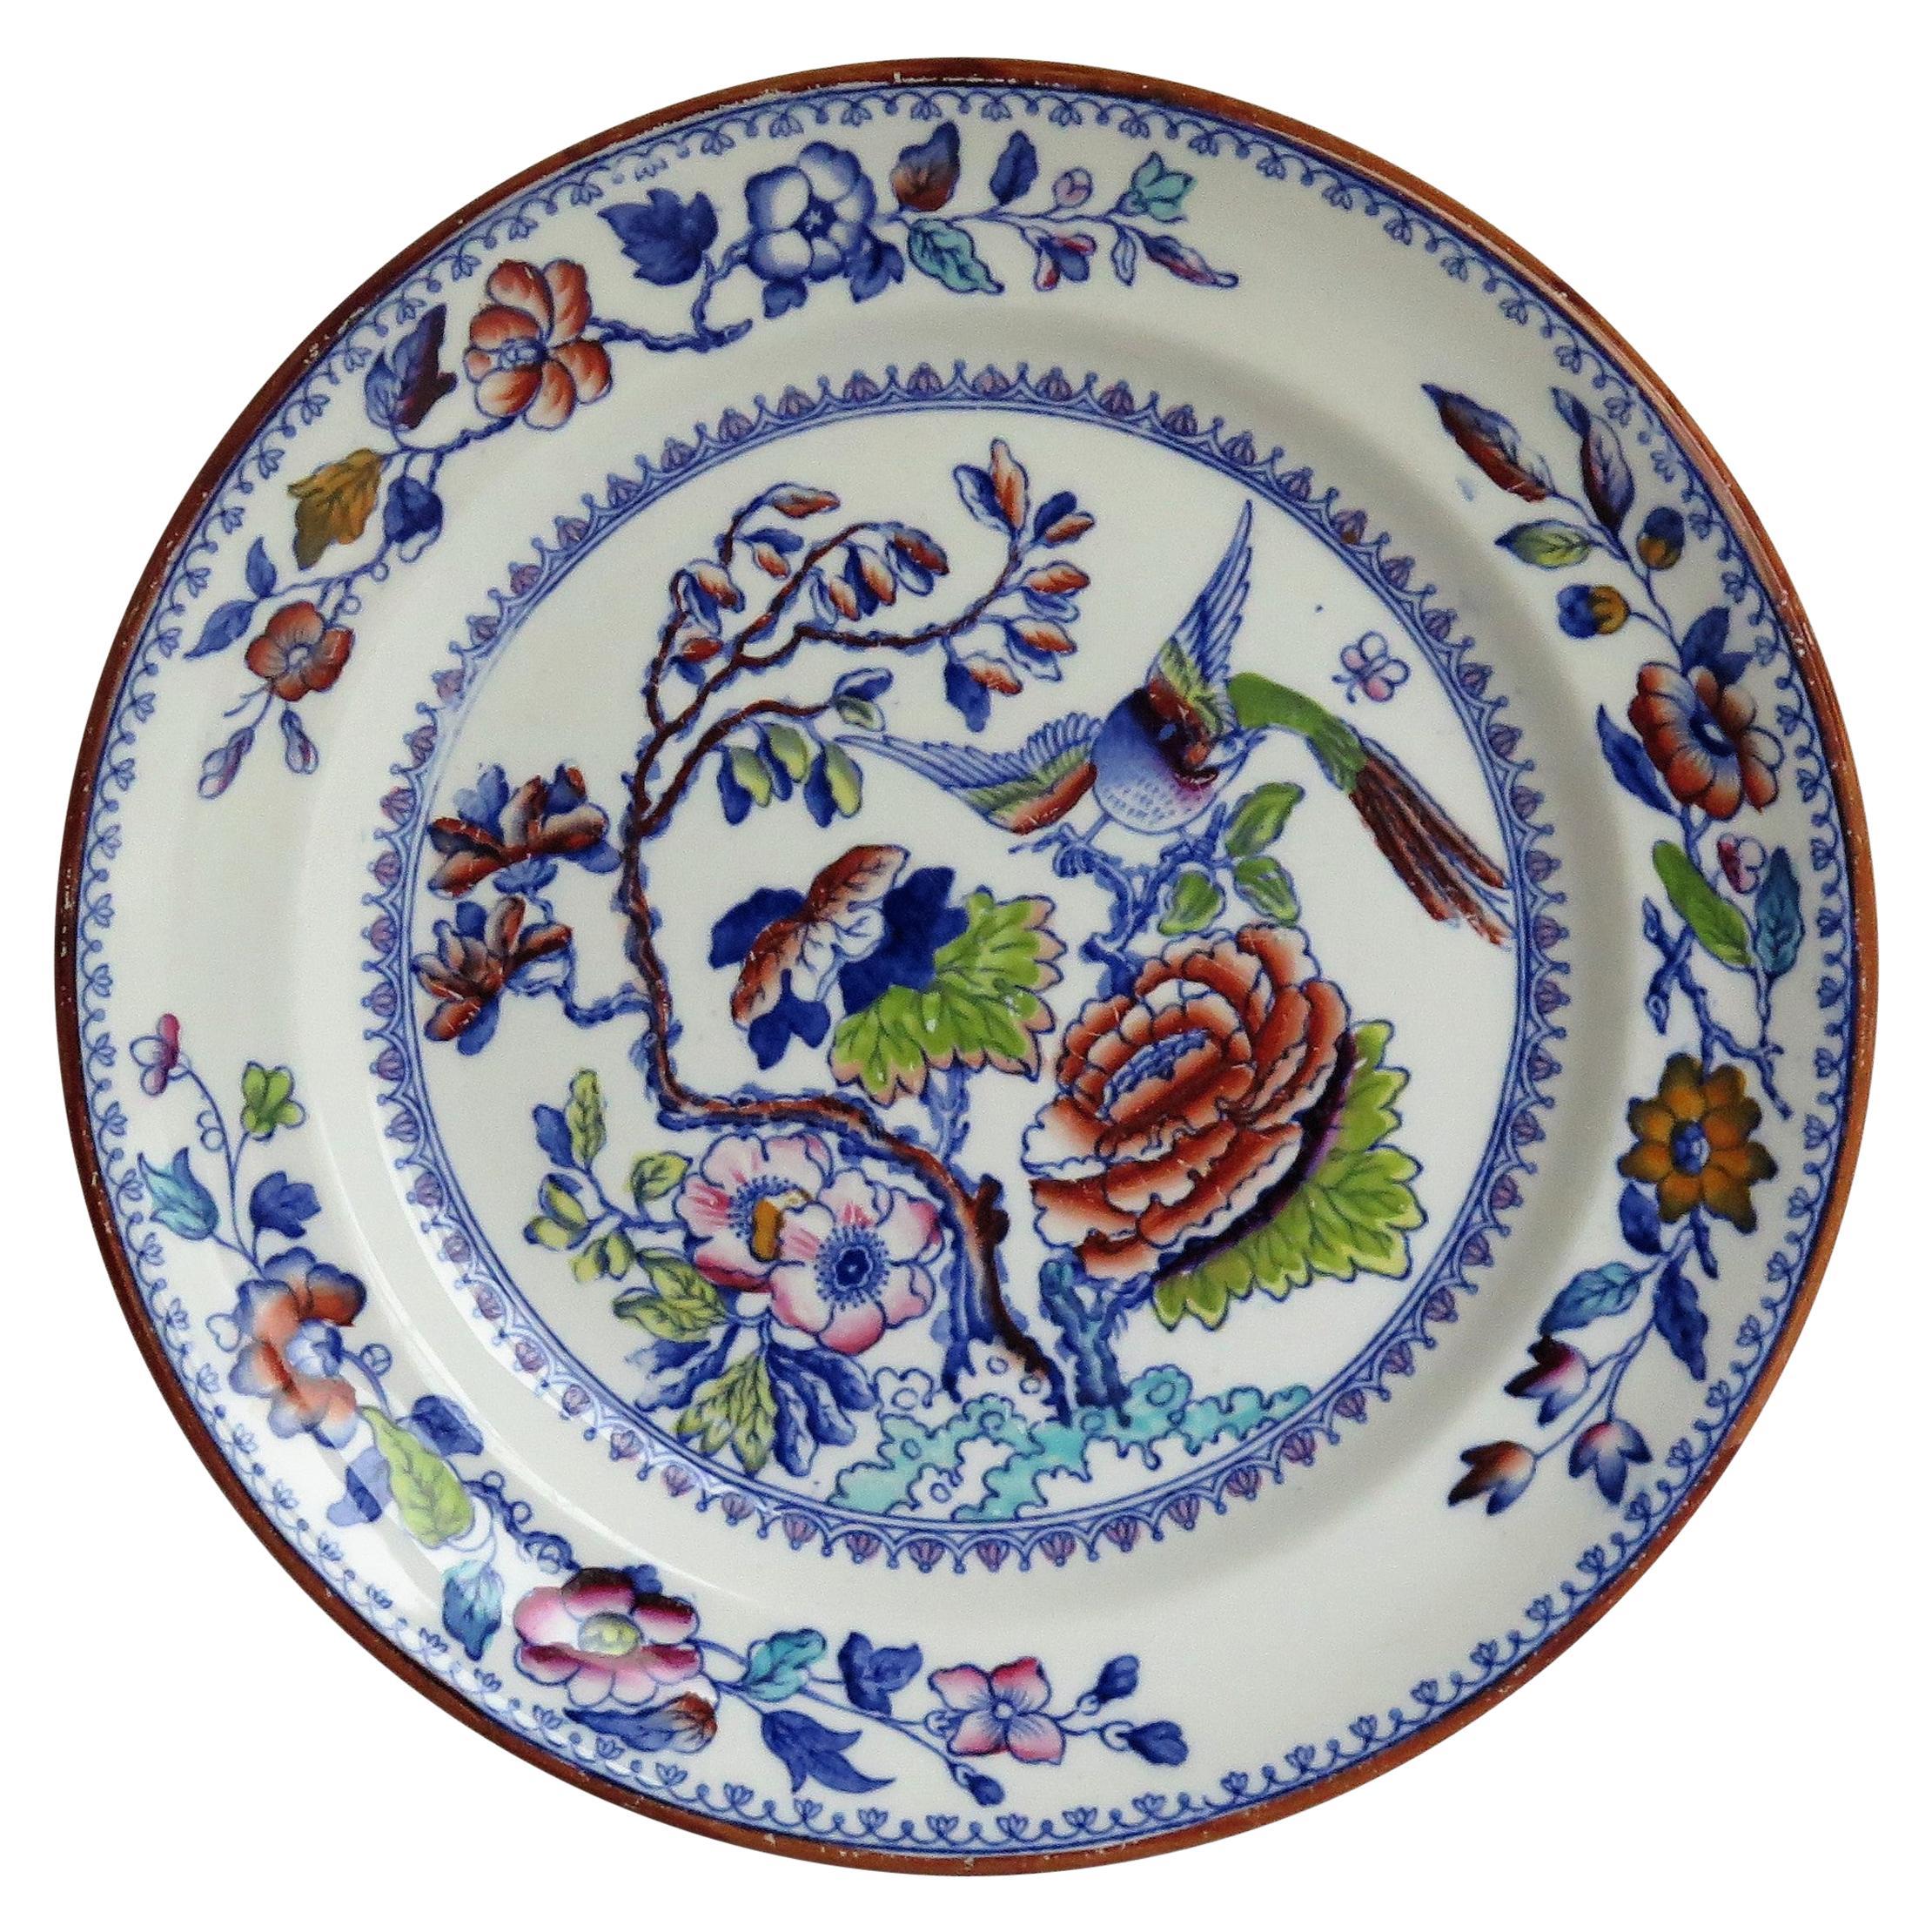 Mason's Ashworth's Ironstone Large Dinner Plate in Flying Bird Pattern, Ca 1900